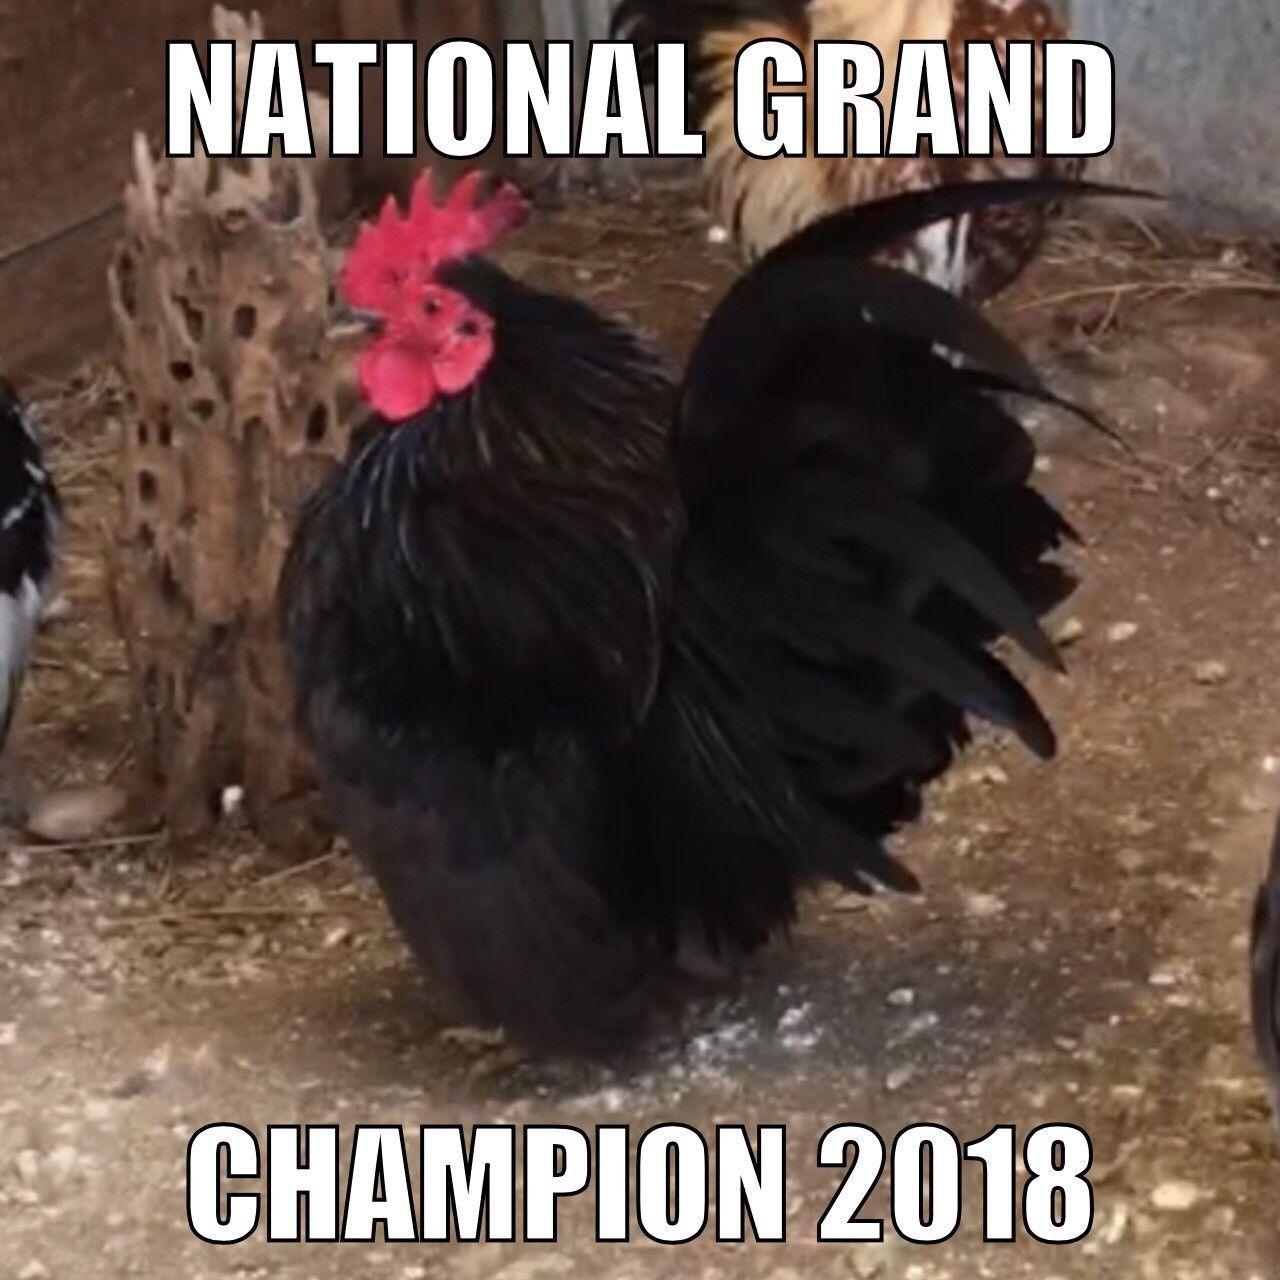 63 Serama Hatching Eggs Smallest Chicken NPIP Champion